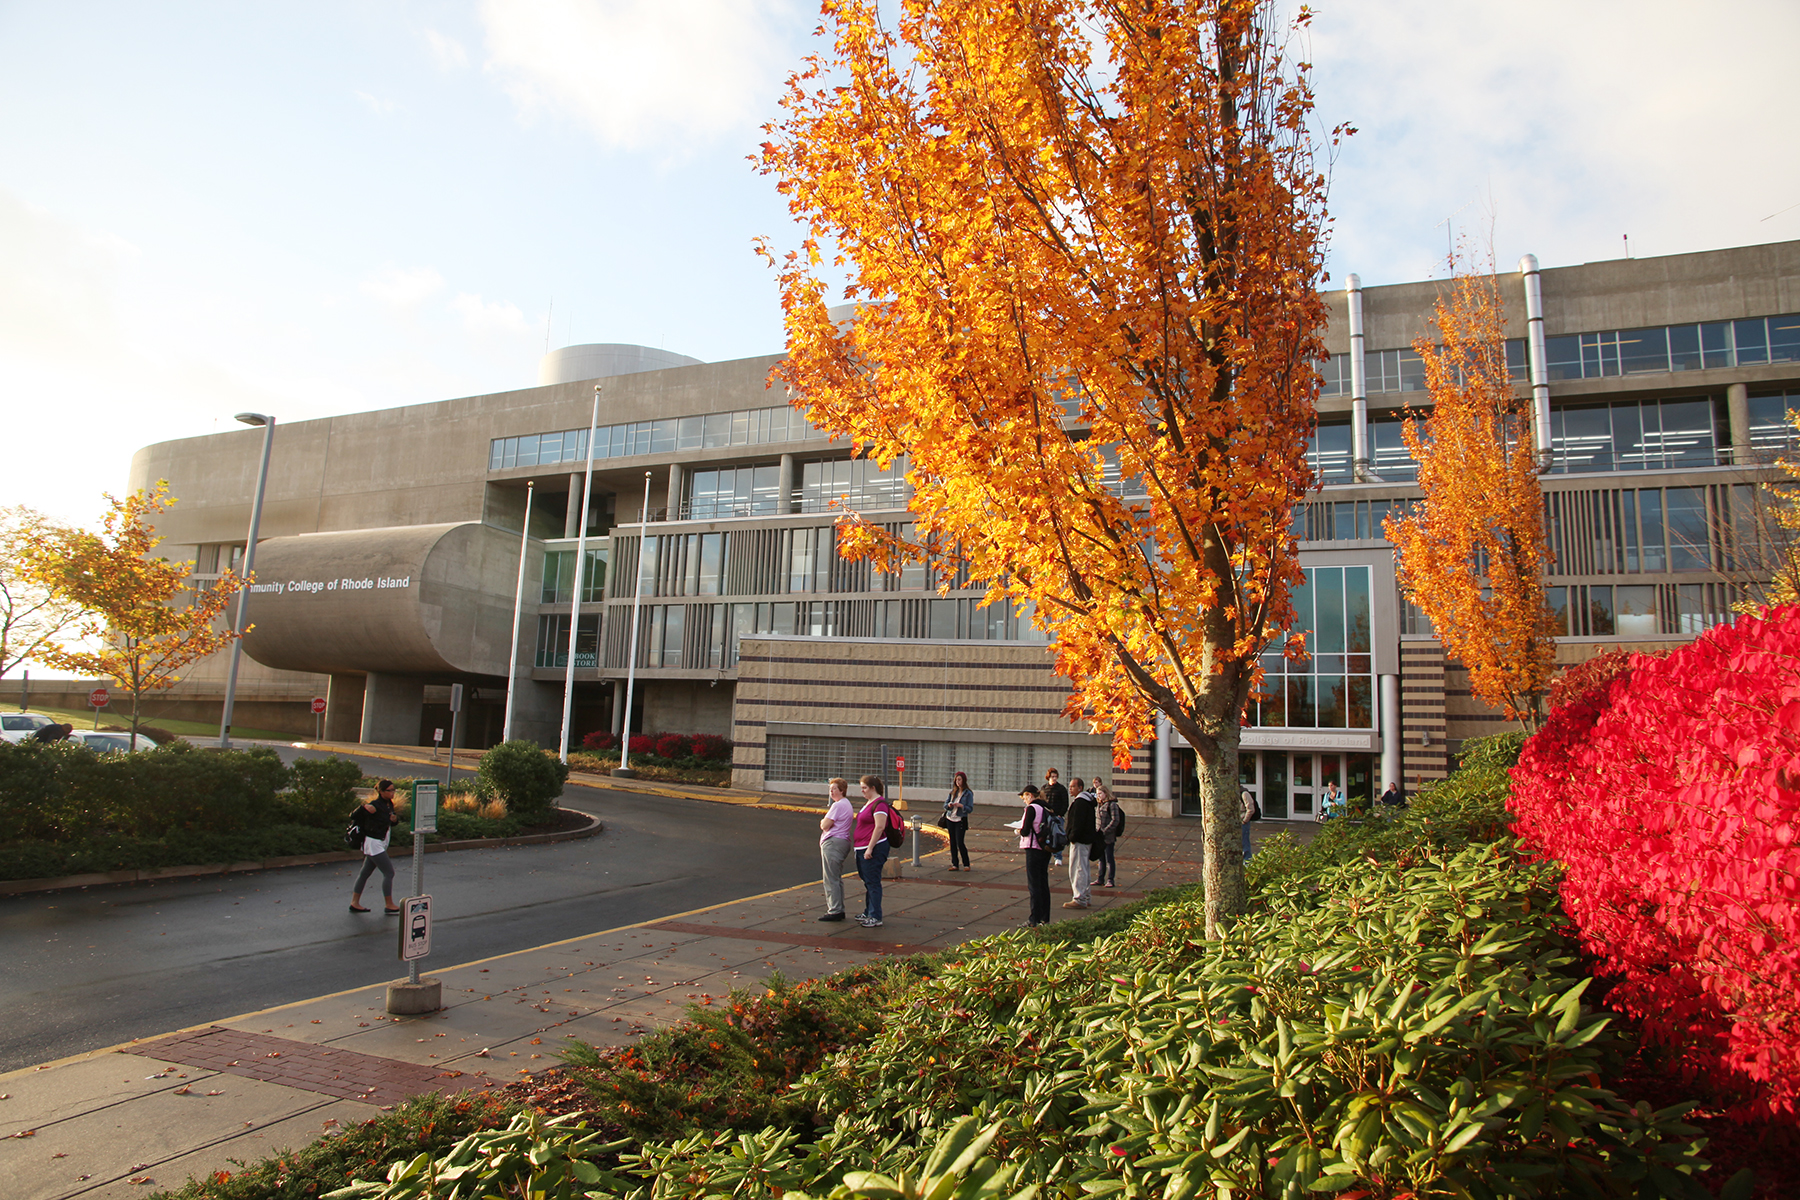 Community College of Rhode Island campus